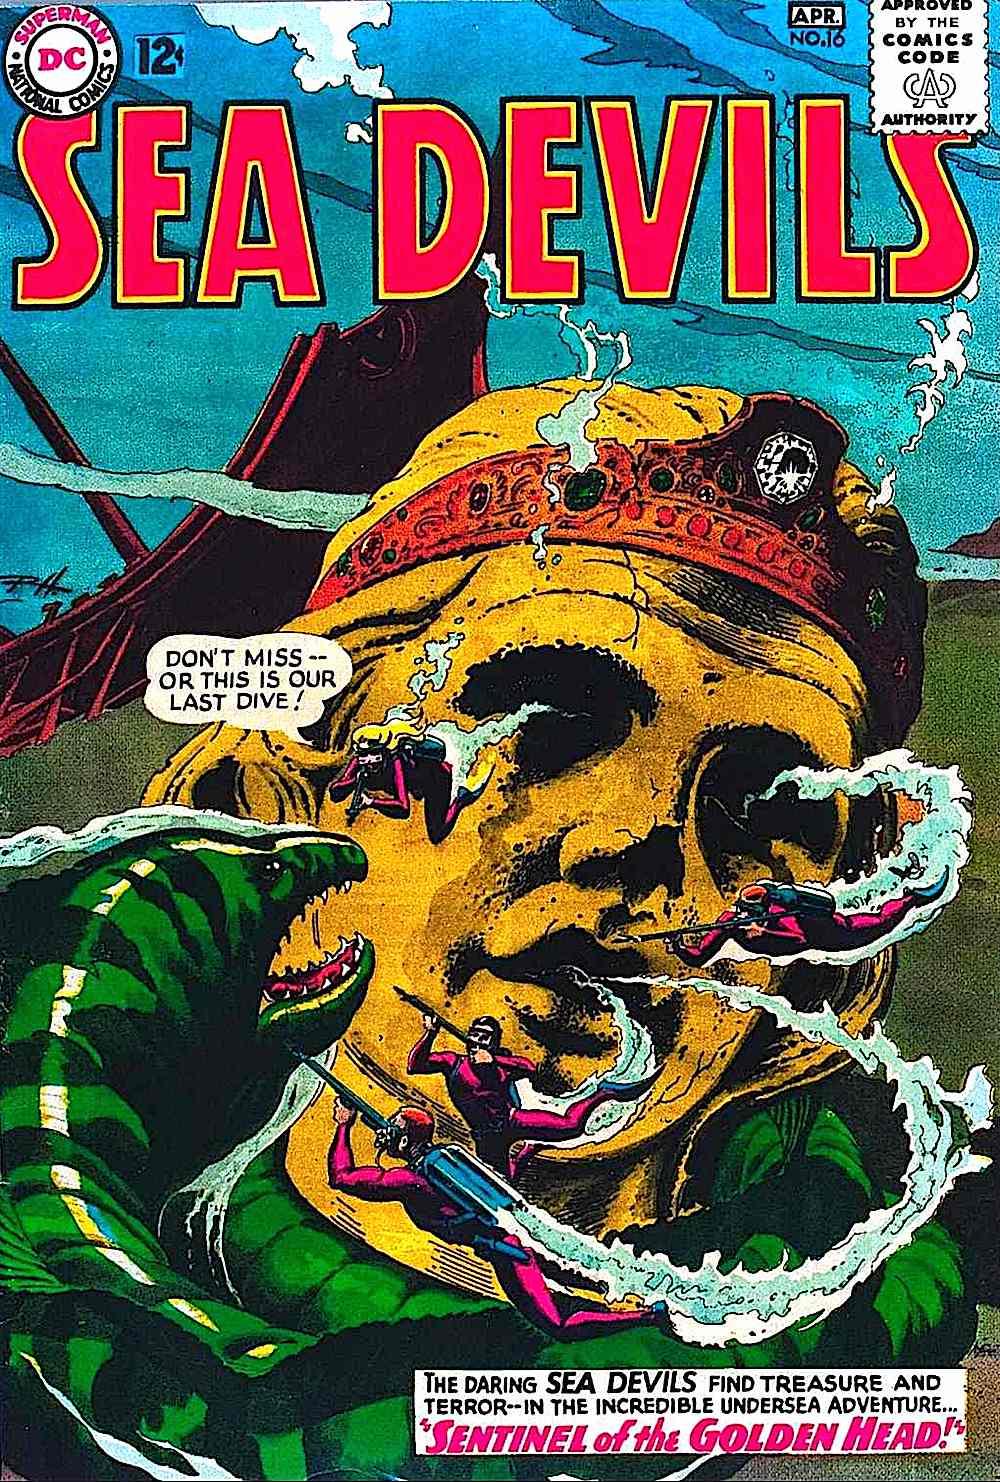 Sea Devils, a comic book by Russ Heath, Sentinal of The Golden Head